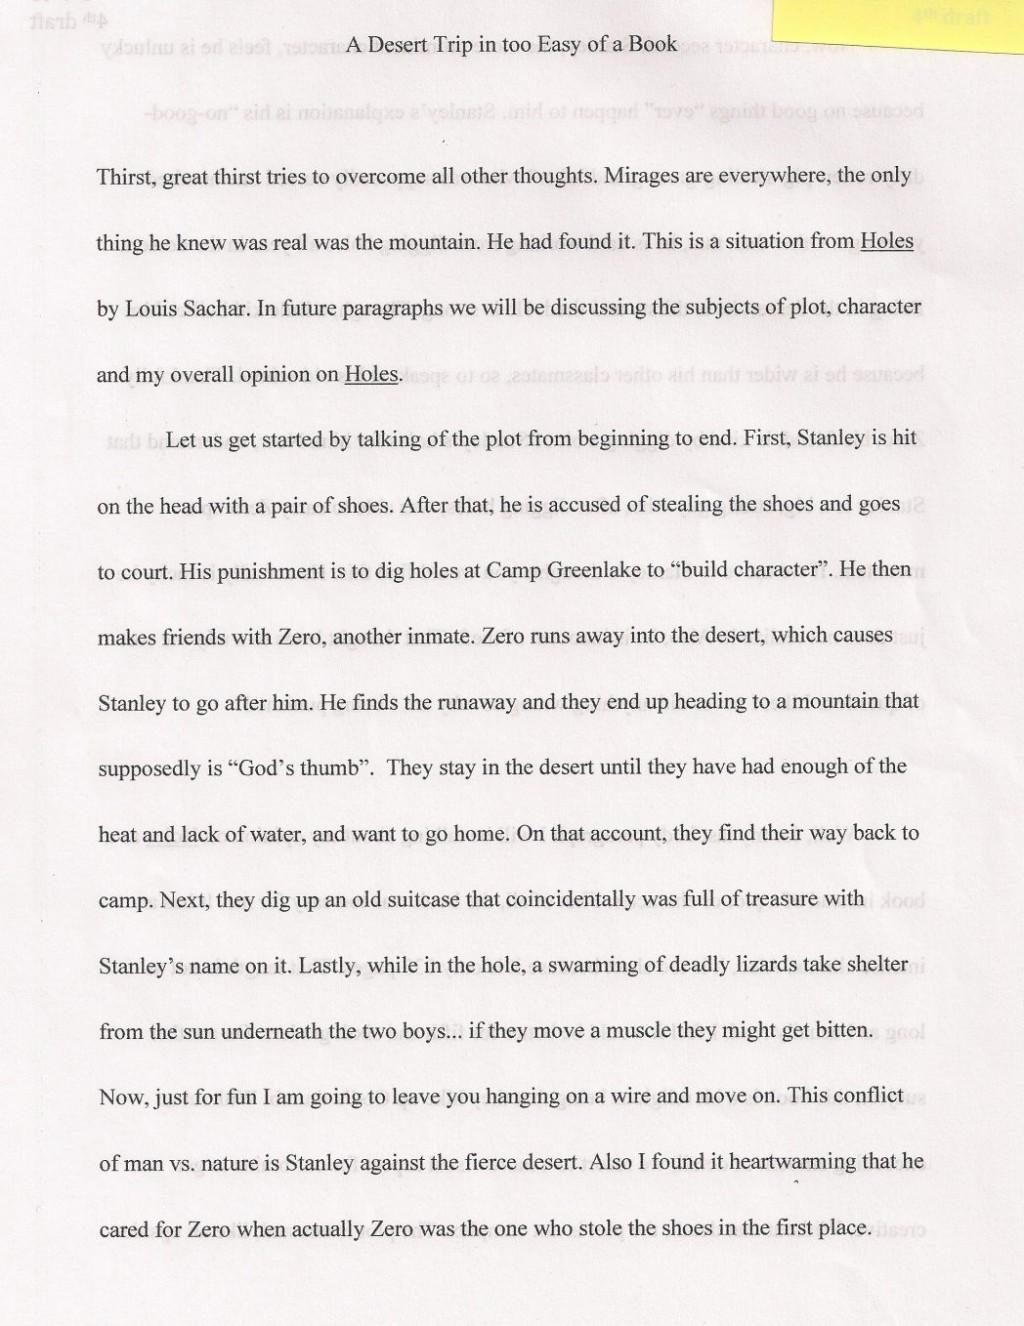 028 Good Essay Hooks For Argument Essays Argumentative Colleges Desert Best 1048x1358 Rare Quotes Narrative About Love Large